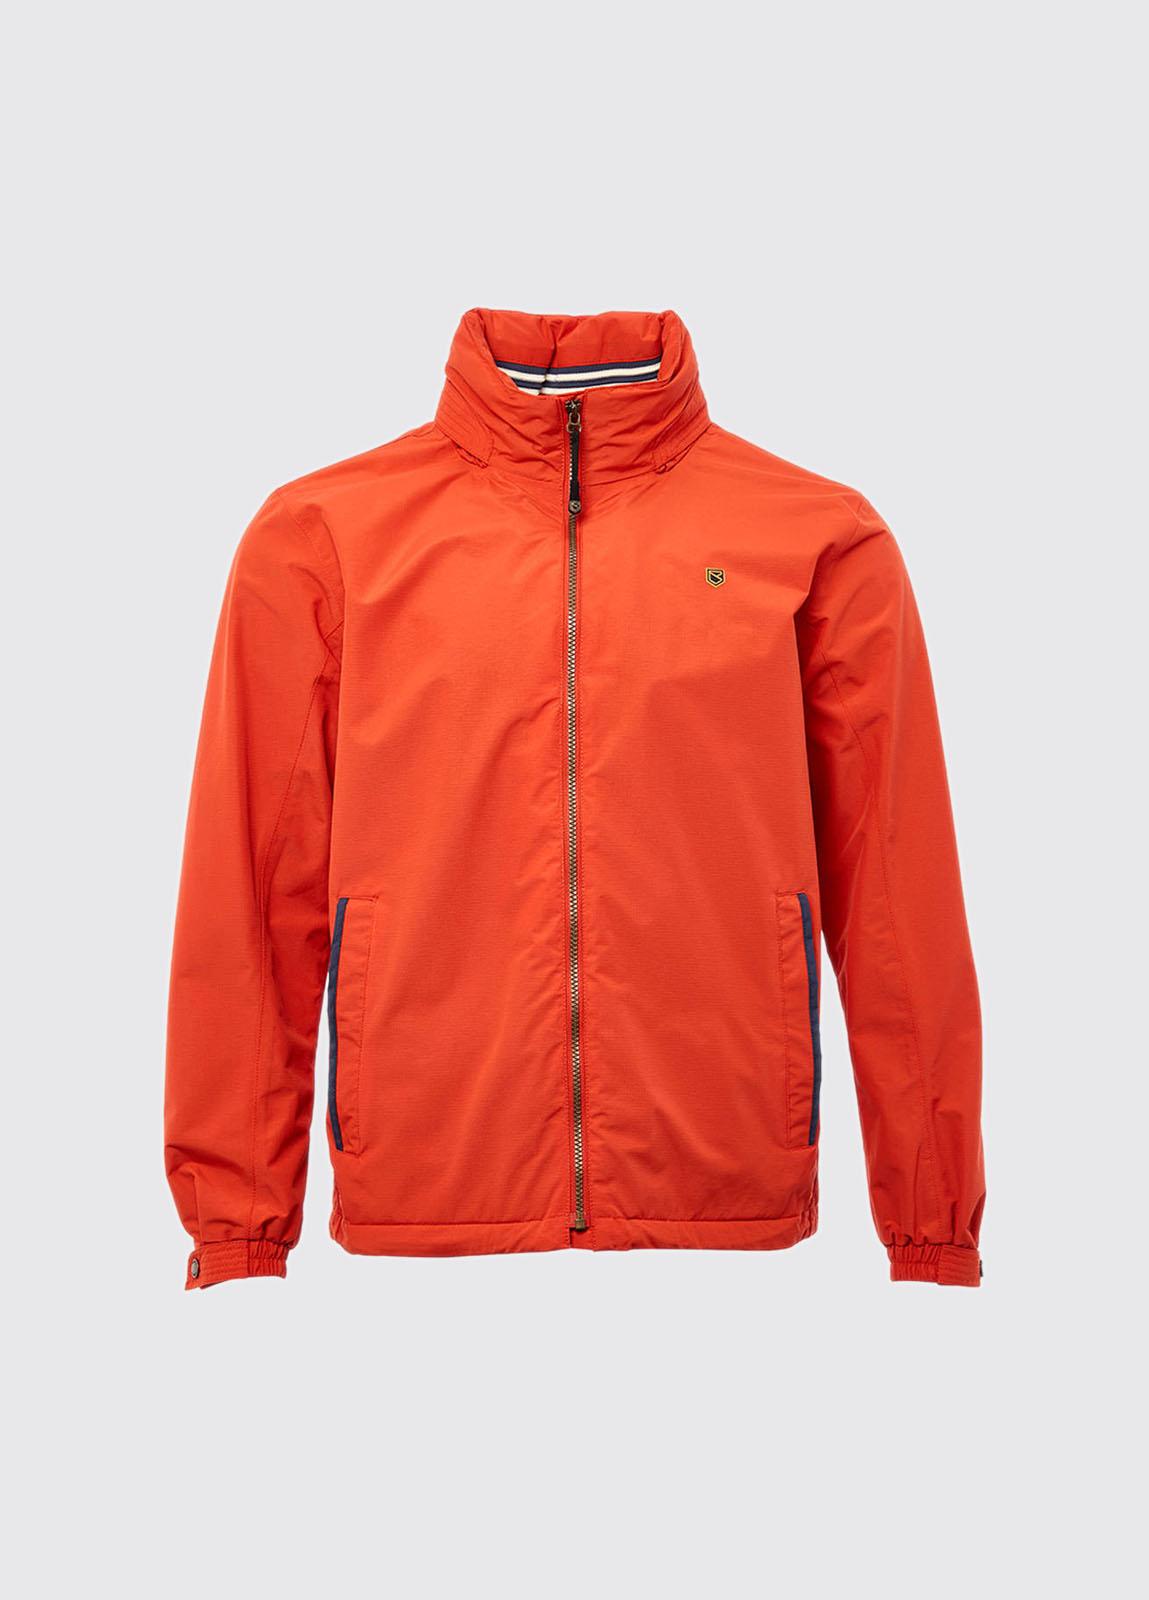 Ballycotton Jacket - Saffron